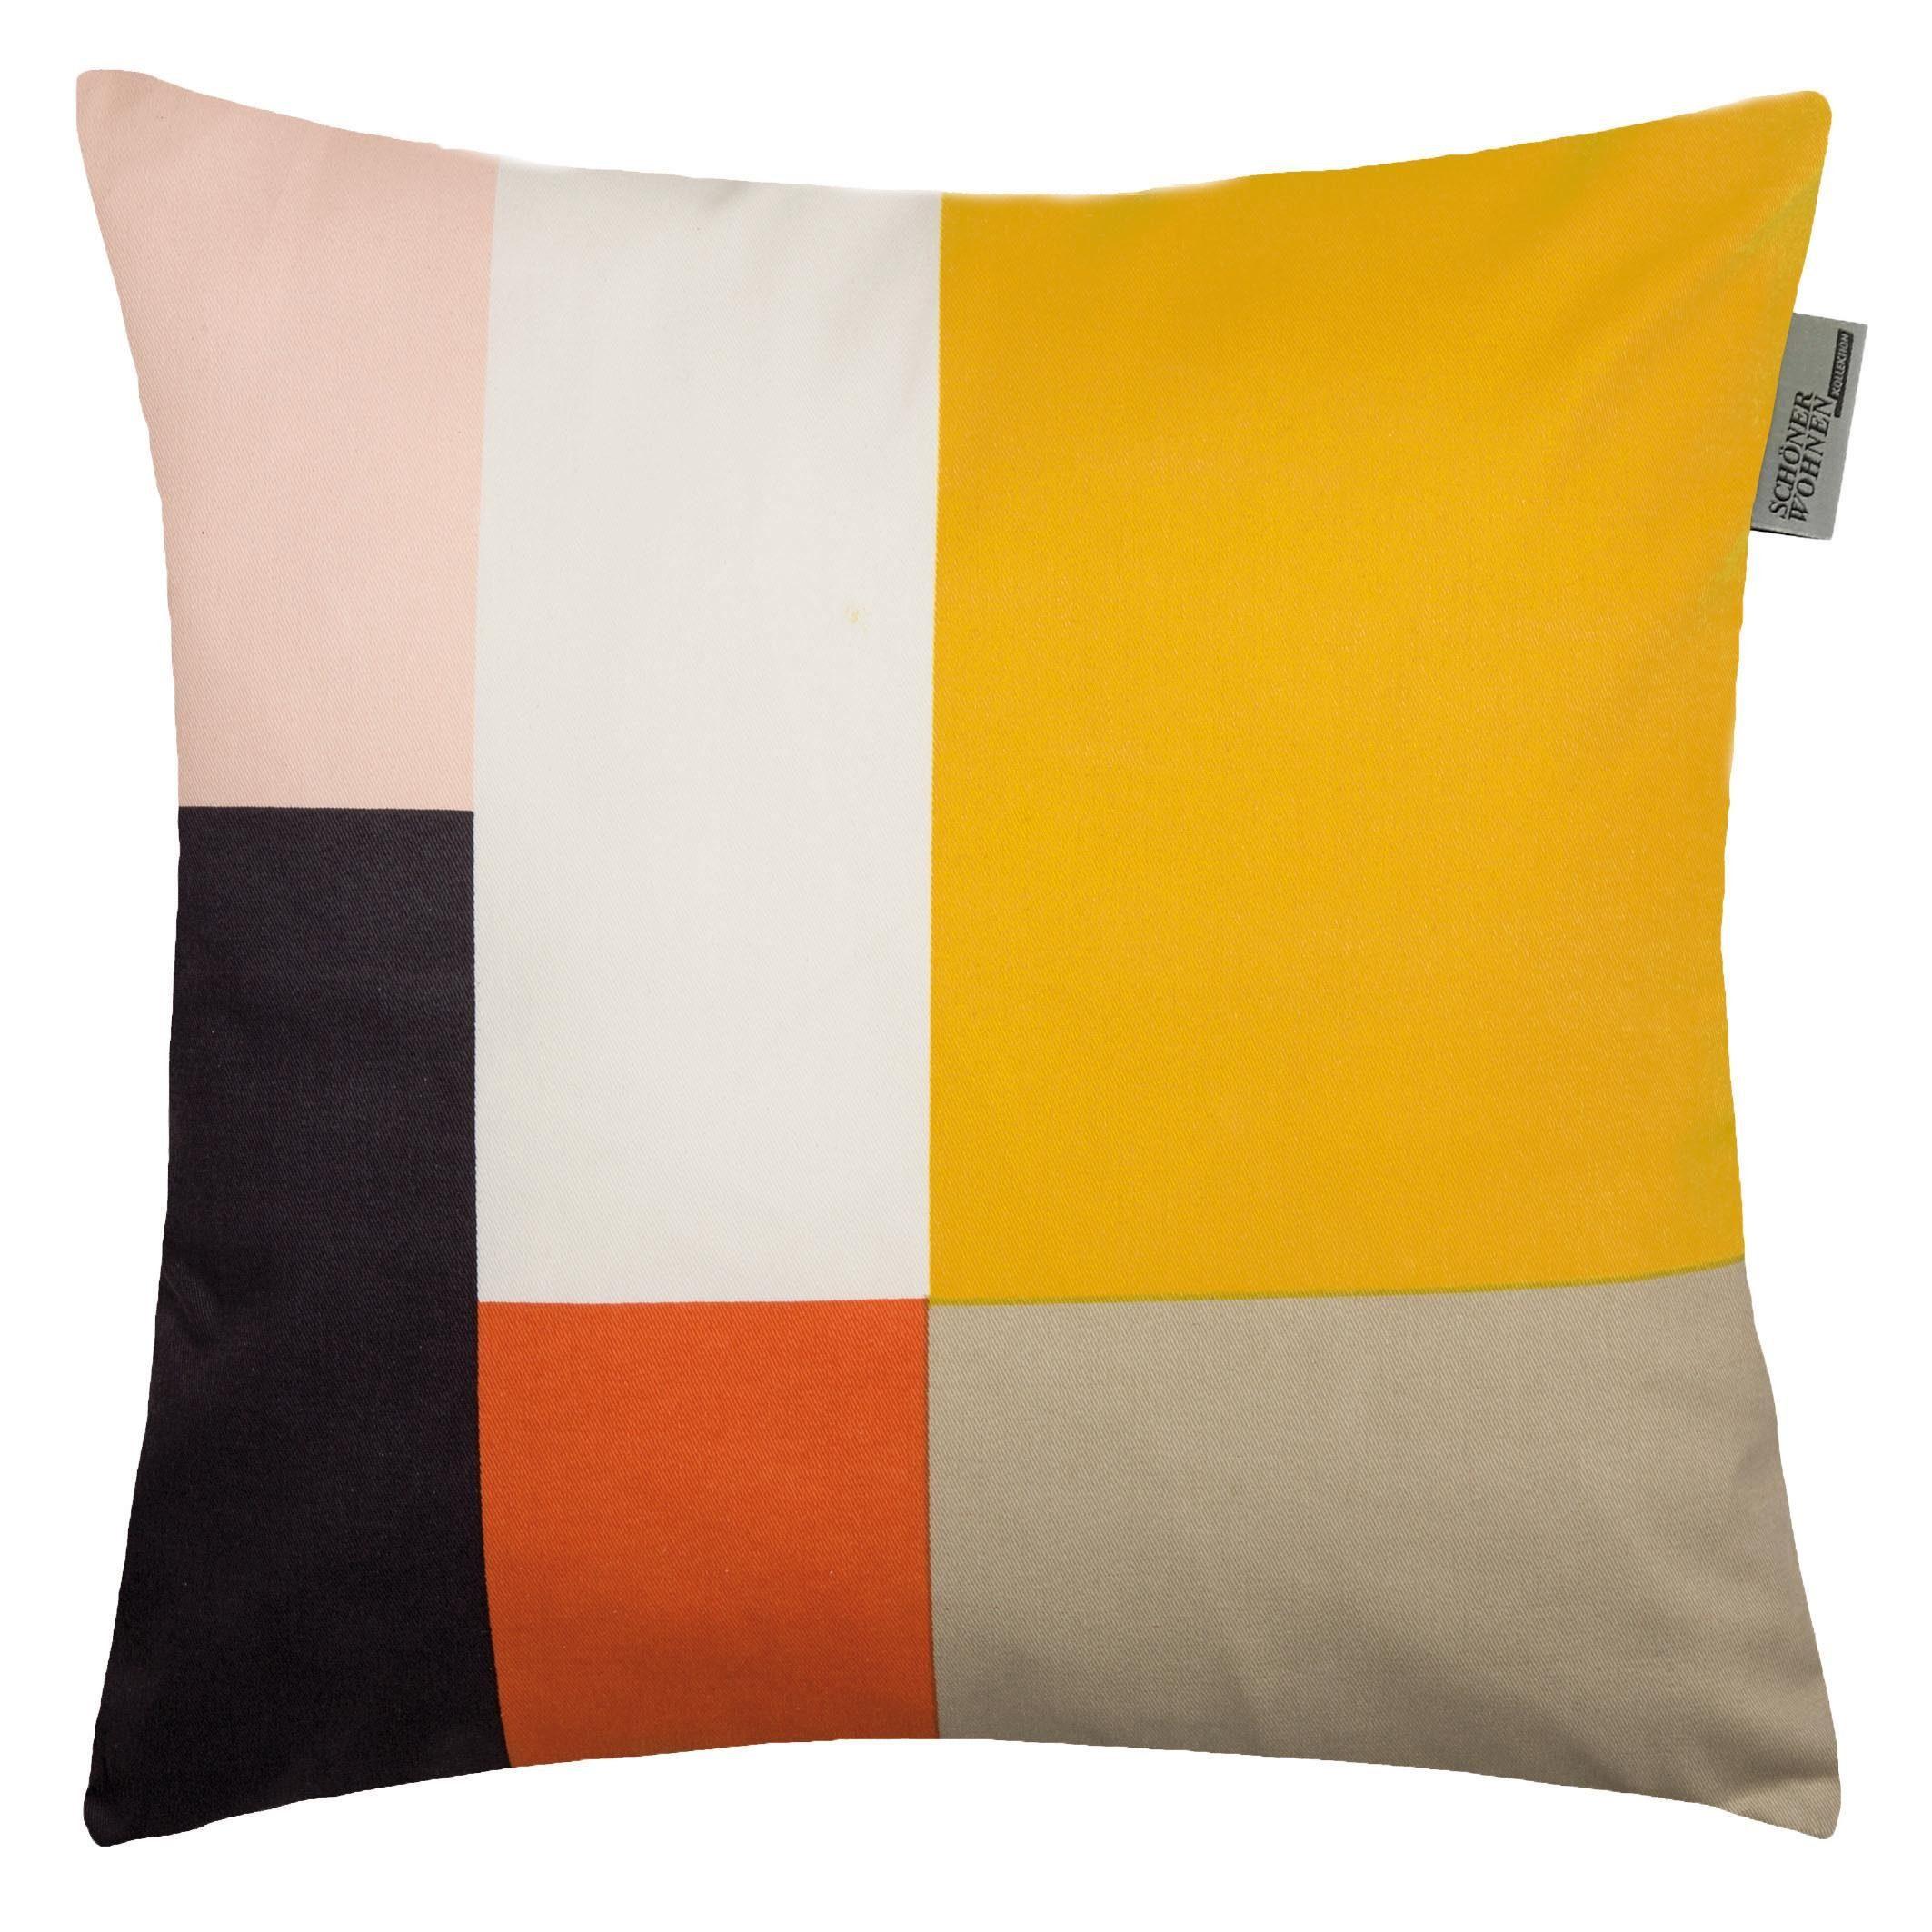 Kissenhüllen, Schöner Wohnen, »Colorblock« (1 Stück)